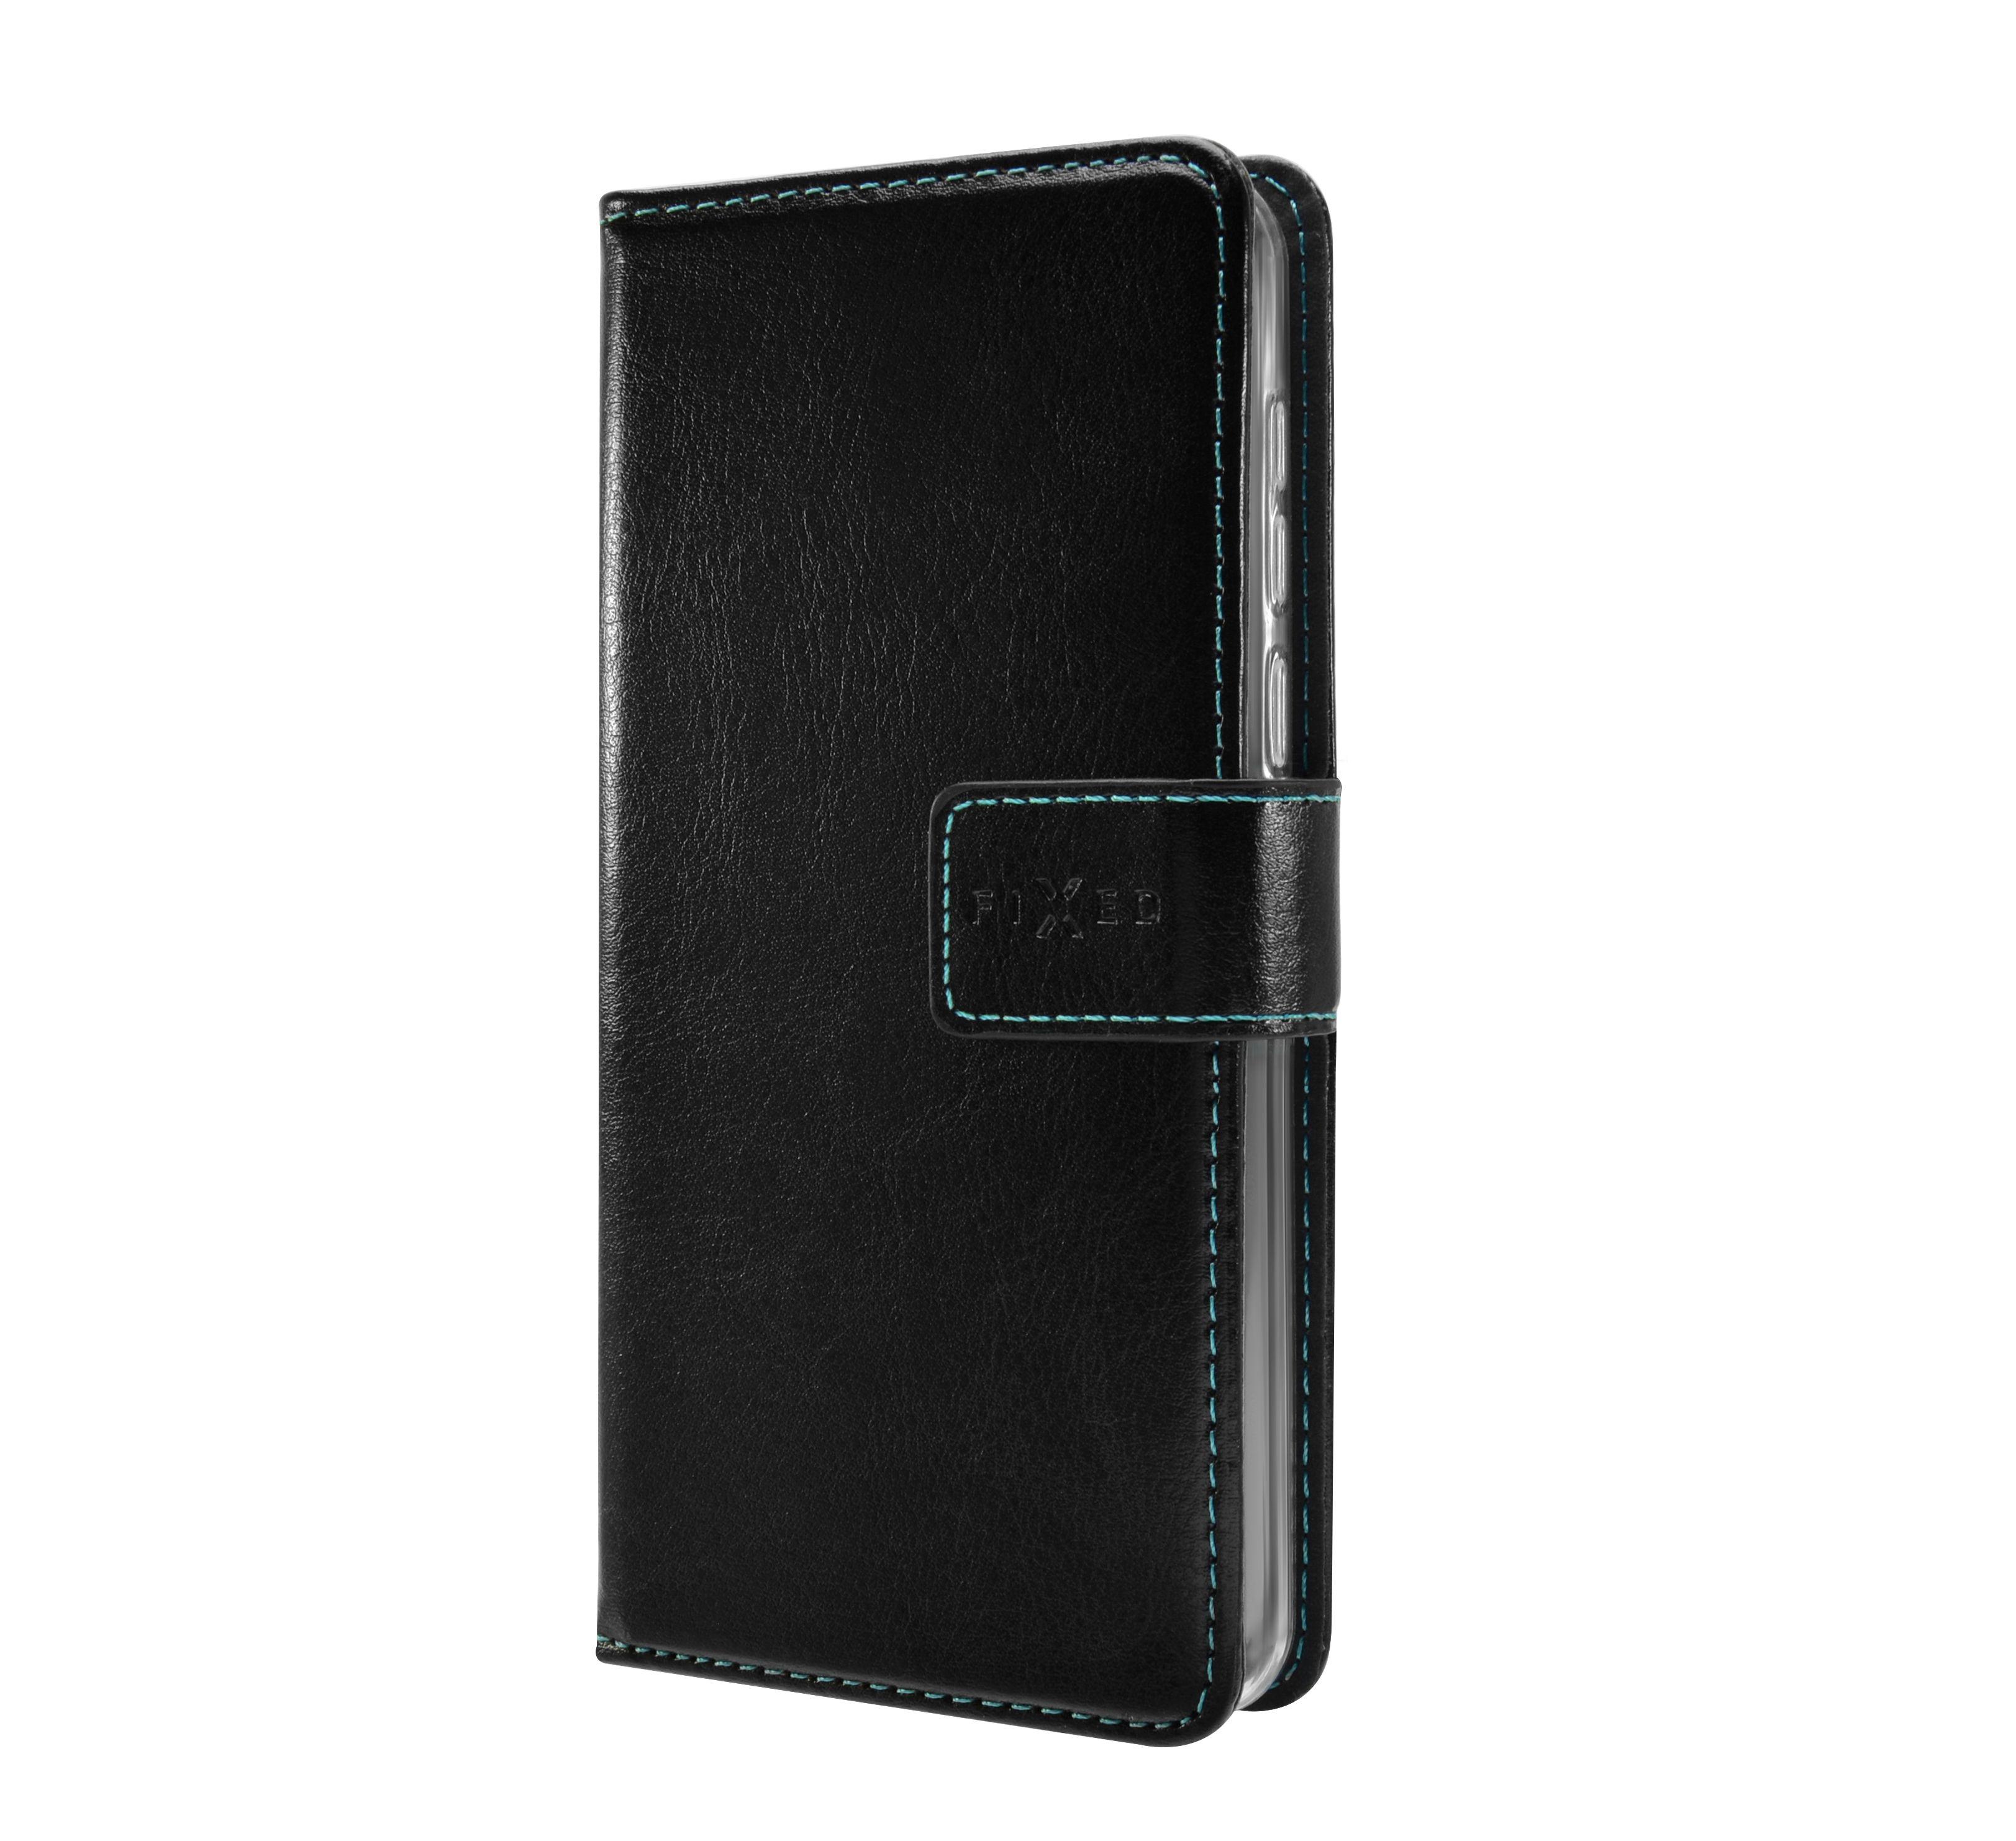 Pouzdro typu kniha FIXED Opus pro Sony Xperia 1 II, černé